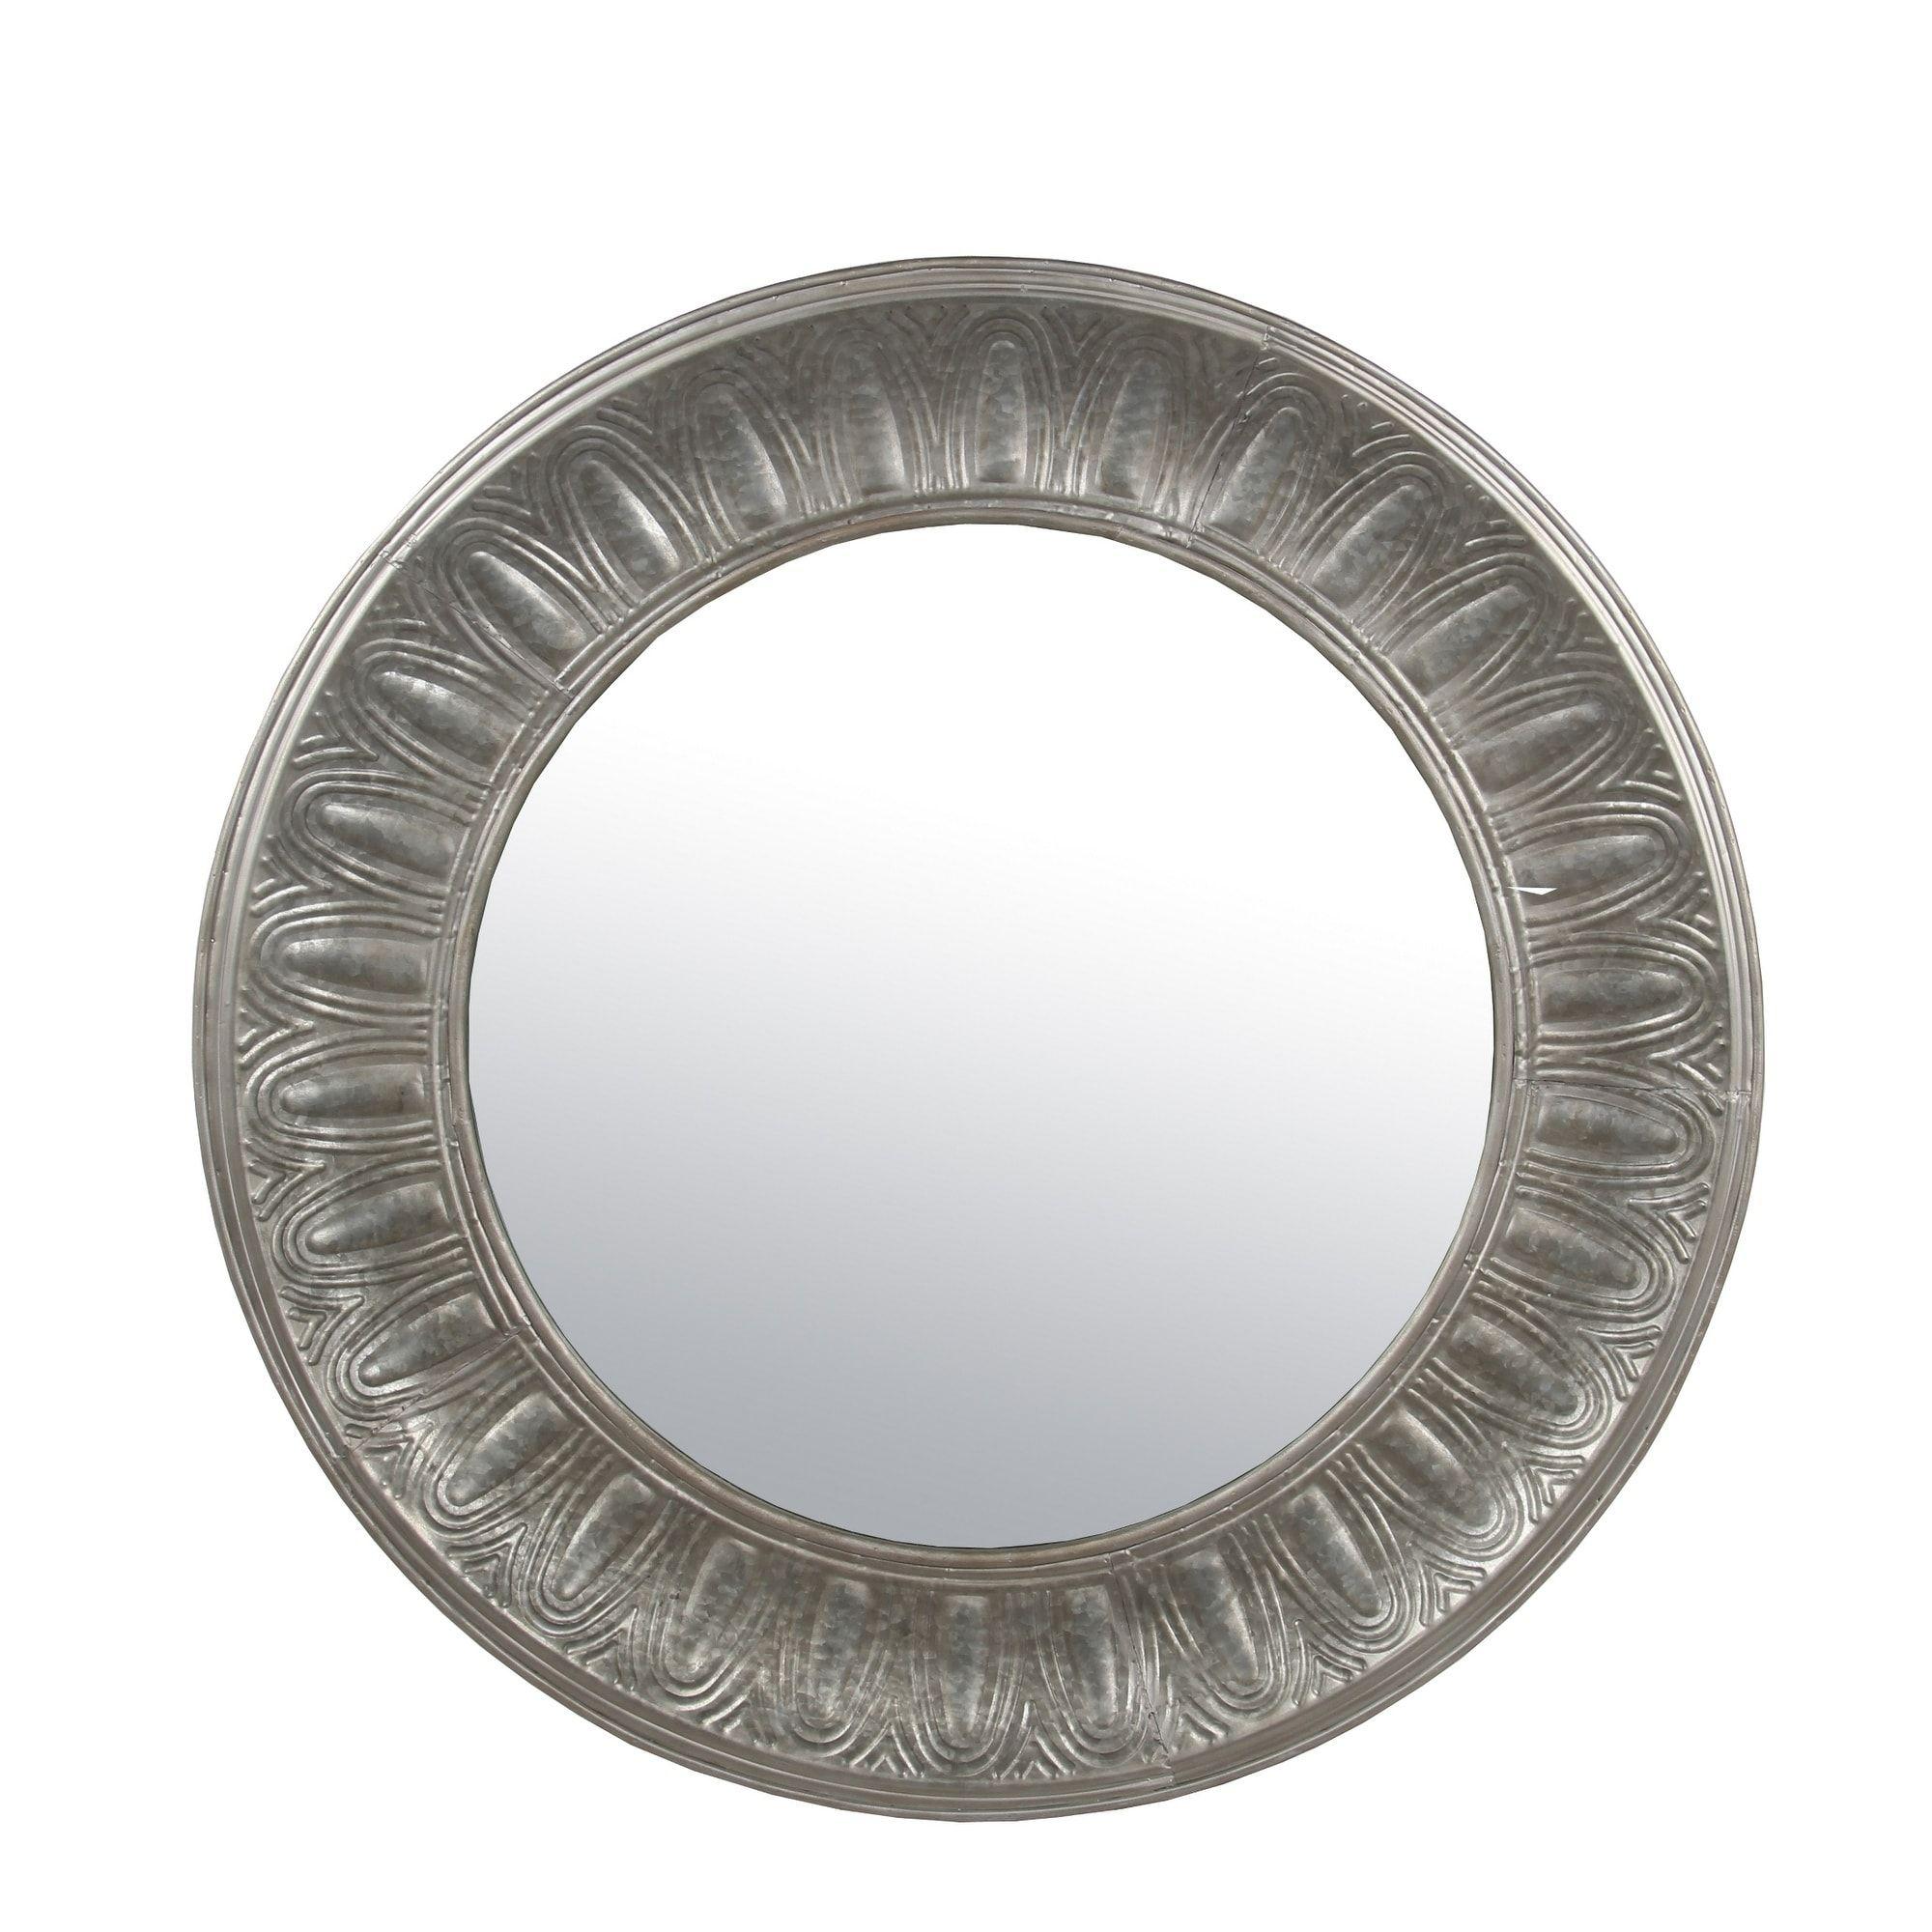 Privilege grey woodmetal round mirror round mirrors rounding and